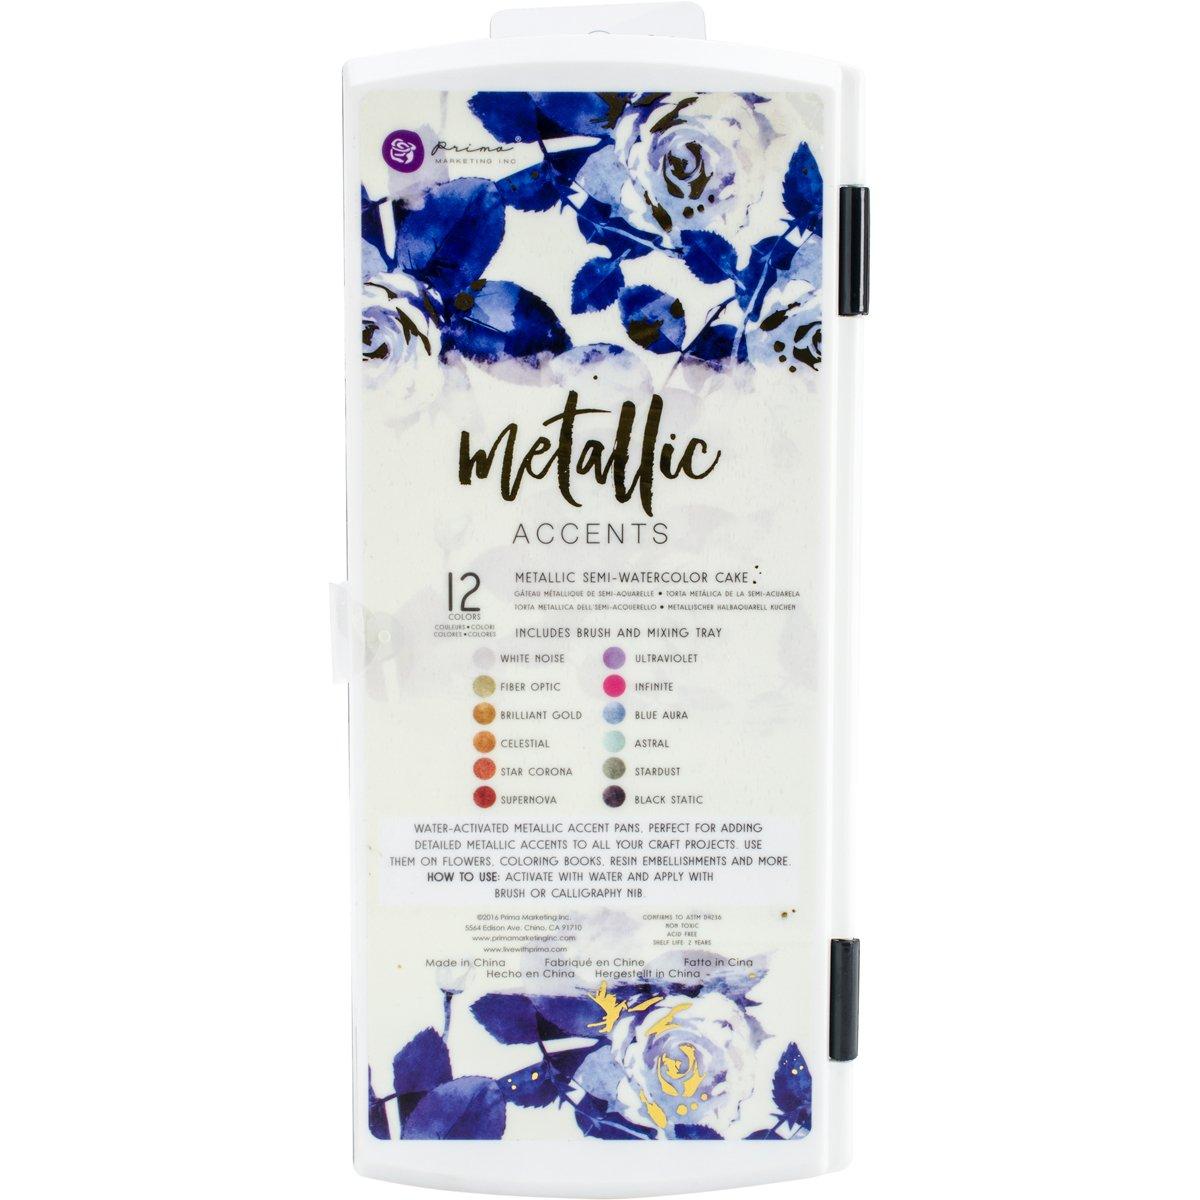 Prima Marketing Metallic Accents Semi Watercolour Paint Set, Multi Colour, 11.17 X 23.87 X 1.95 Cm by Amazon